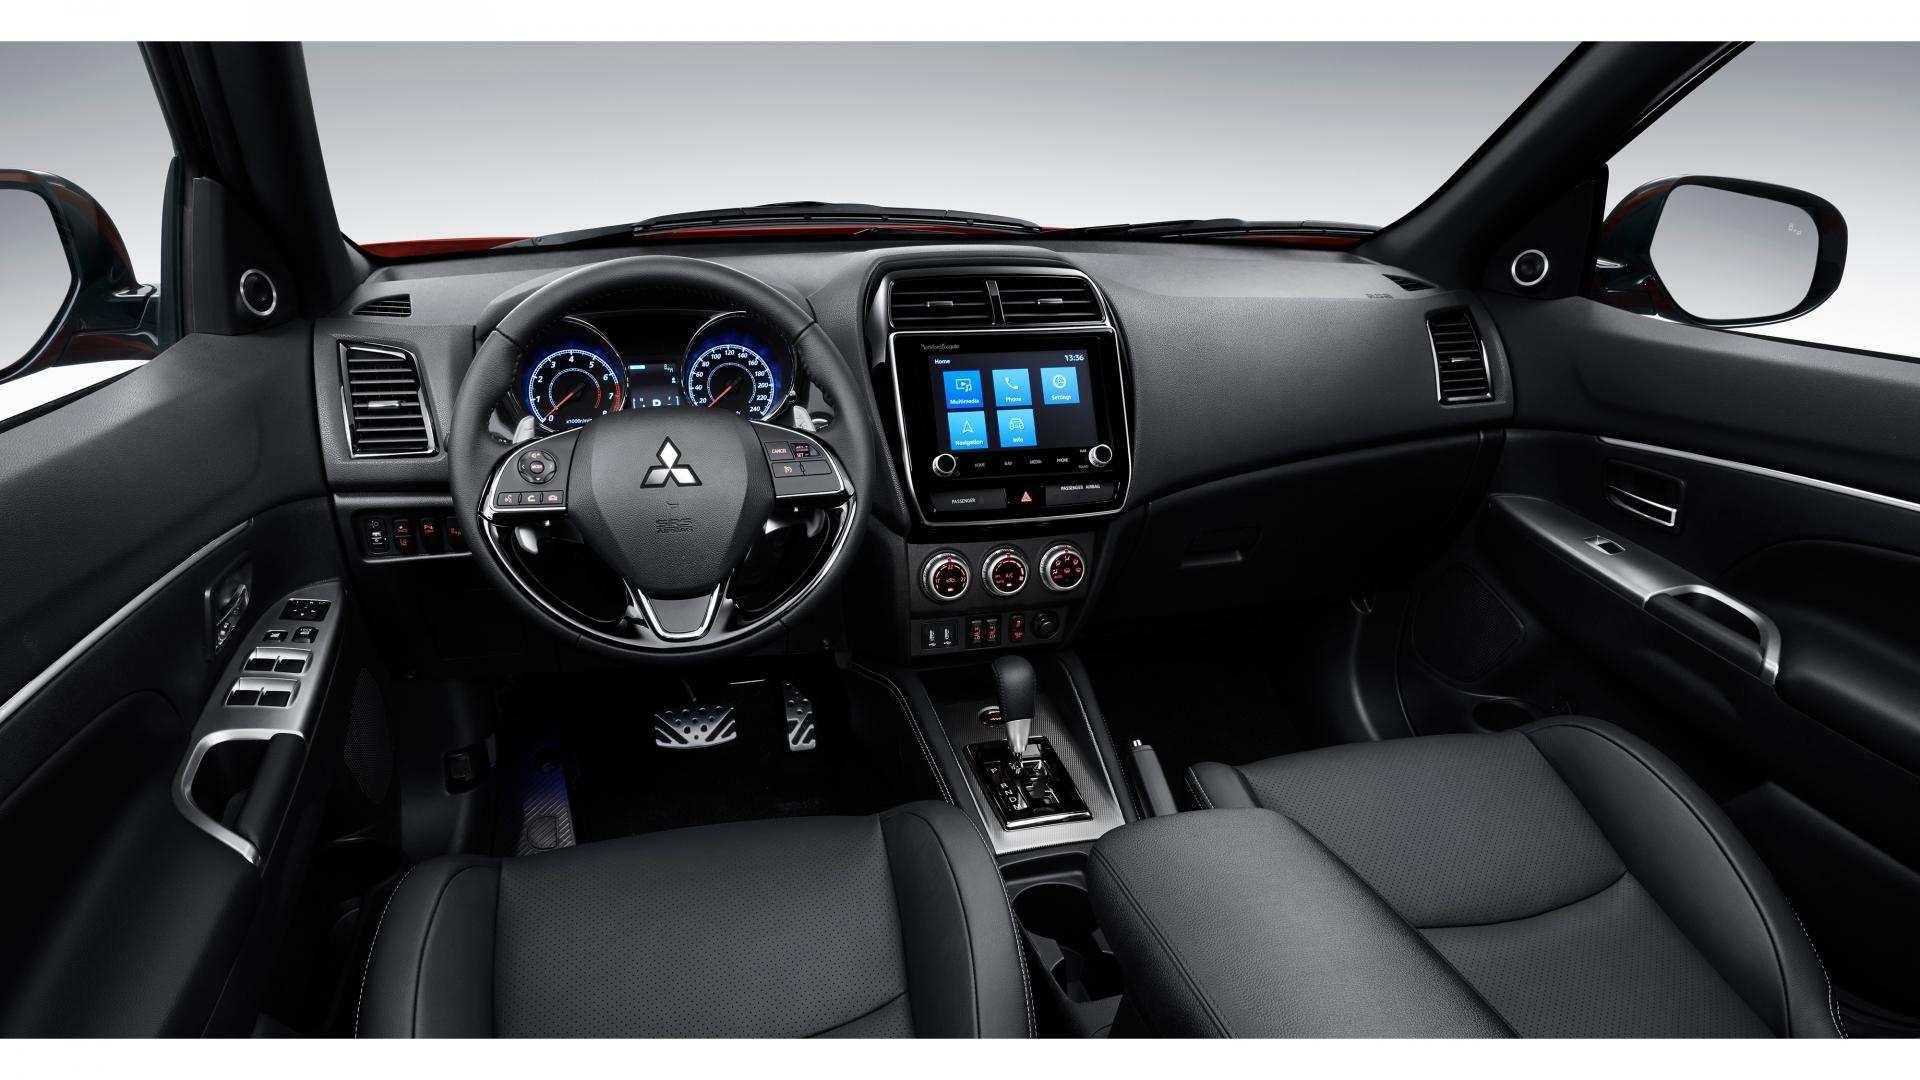 67 All New Mitsubishi Asx 2020 Uscita Specs with Mitsubishi Asx 2020 Uscita